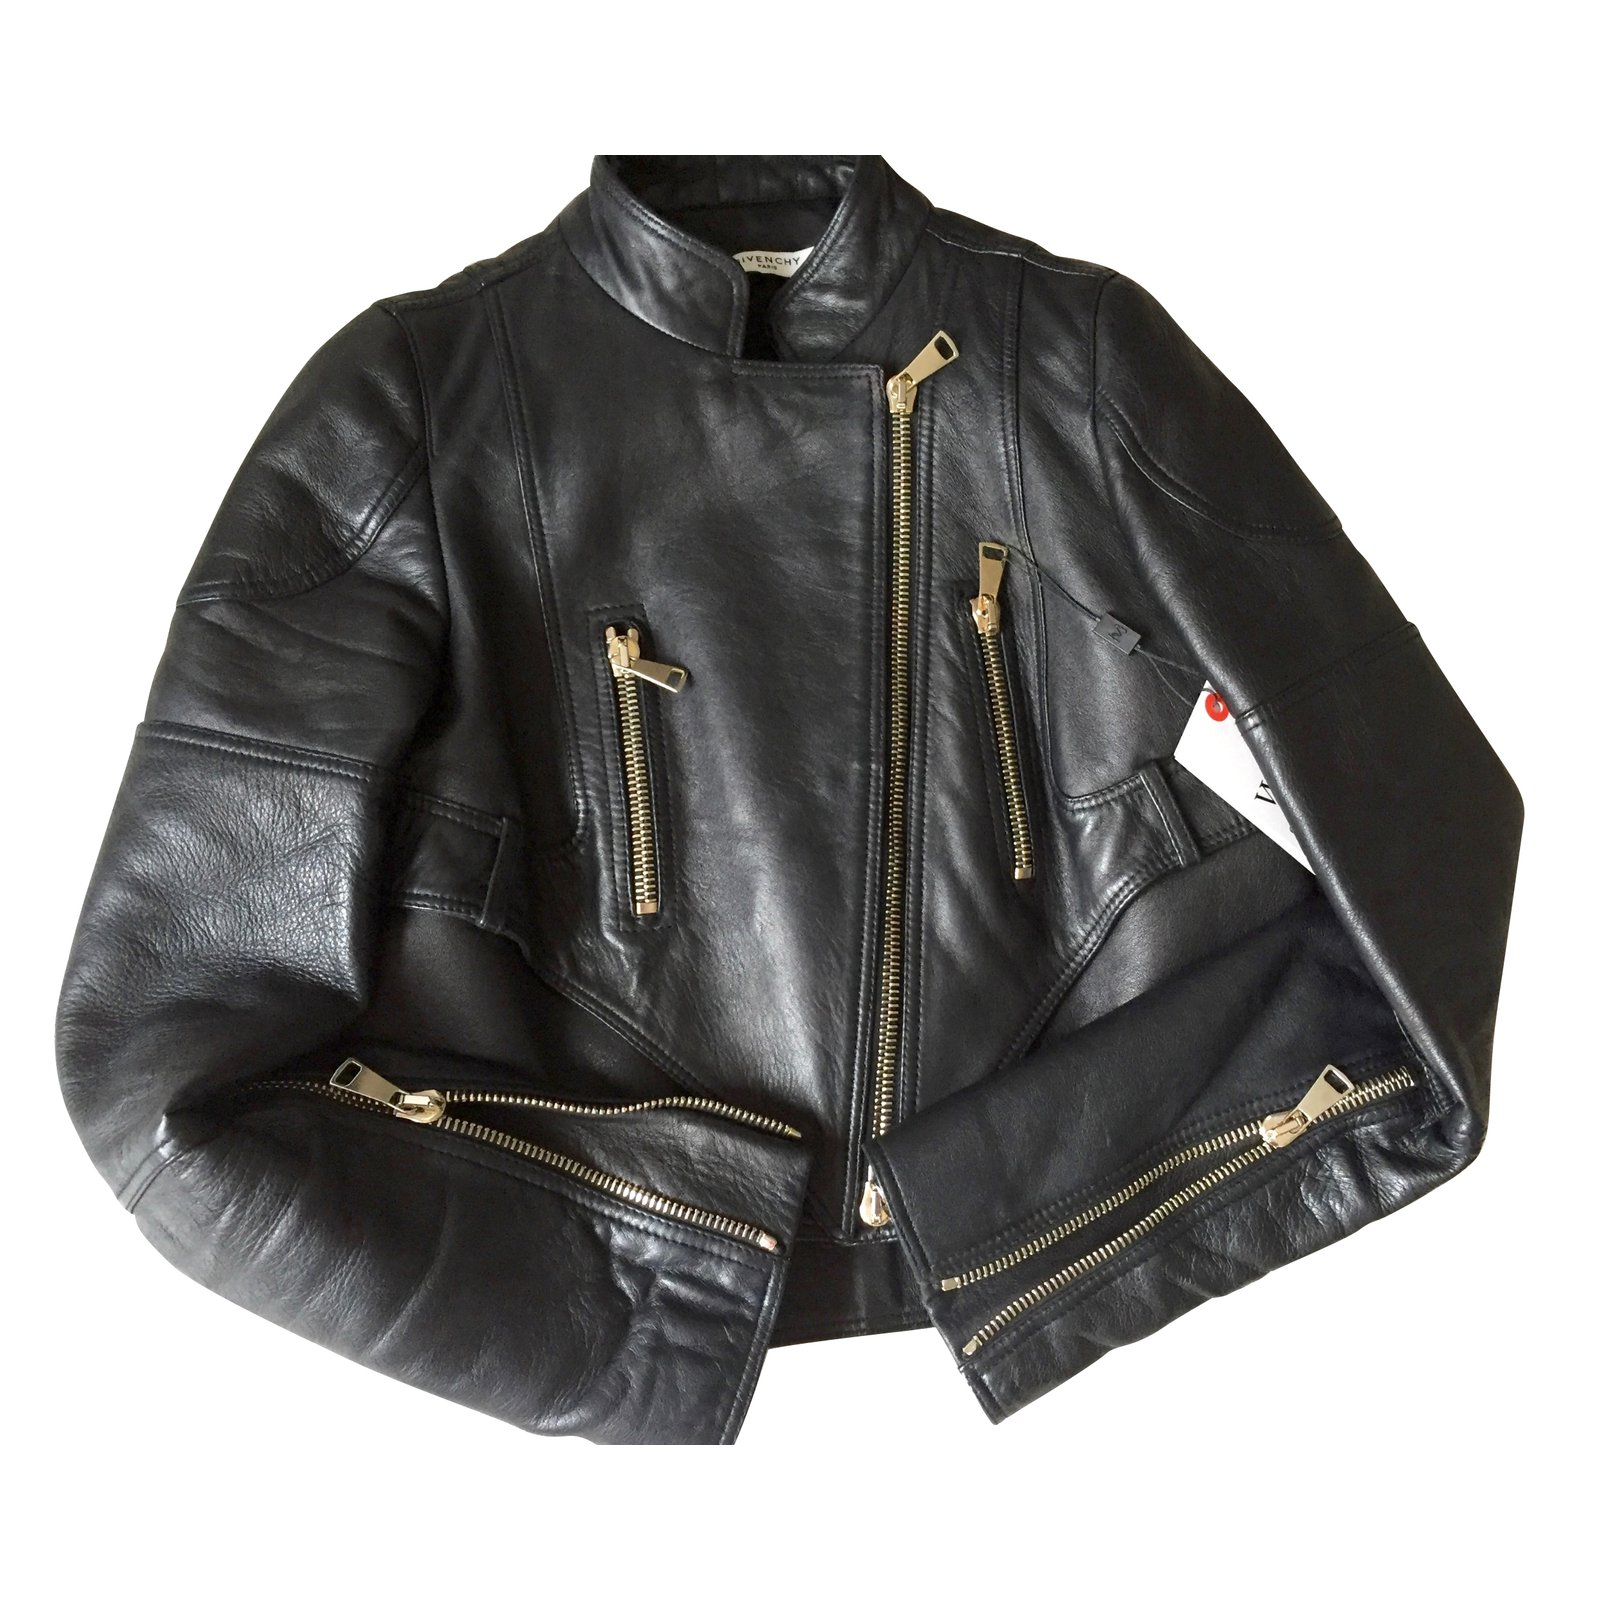 2ac0a9f186424 Givenchy Jacket Jackets Leather Black ref.48898 - Joli Closet